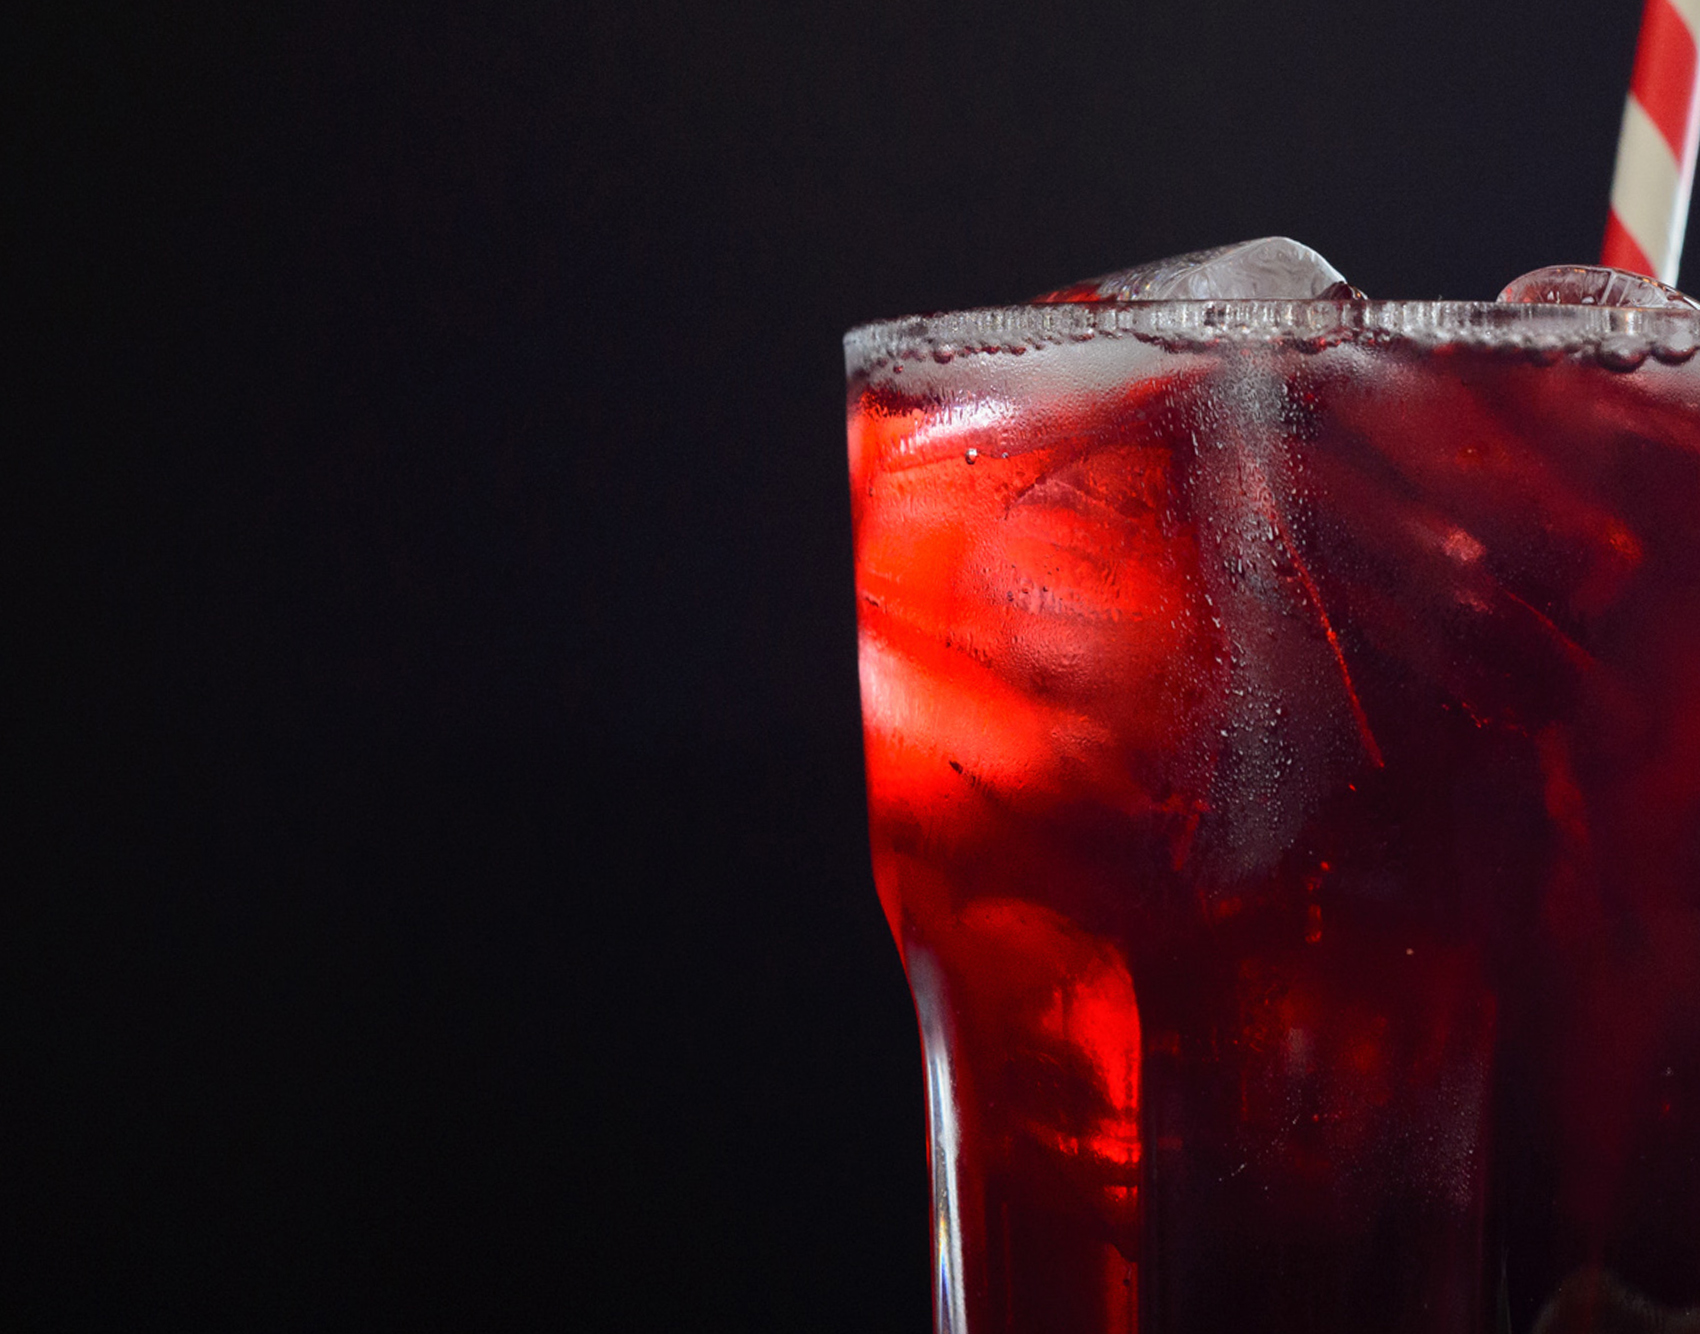 la-popular-taqueria-mexican-restaurant-port-adelaide-south-australia-food-drink-drink.jpg